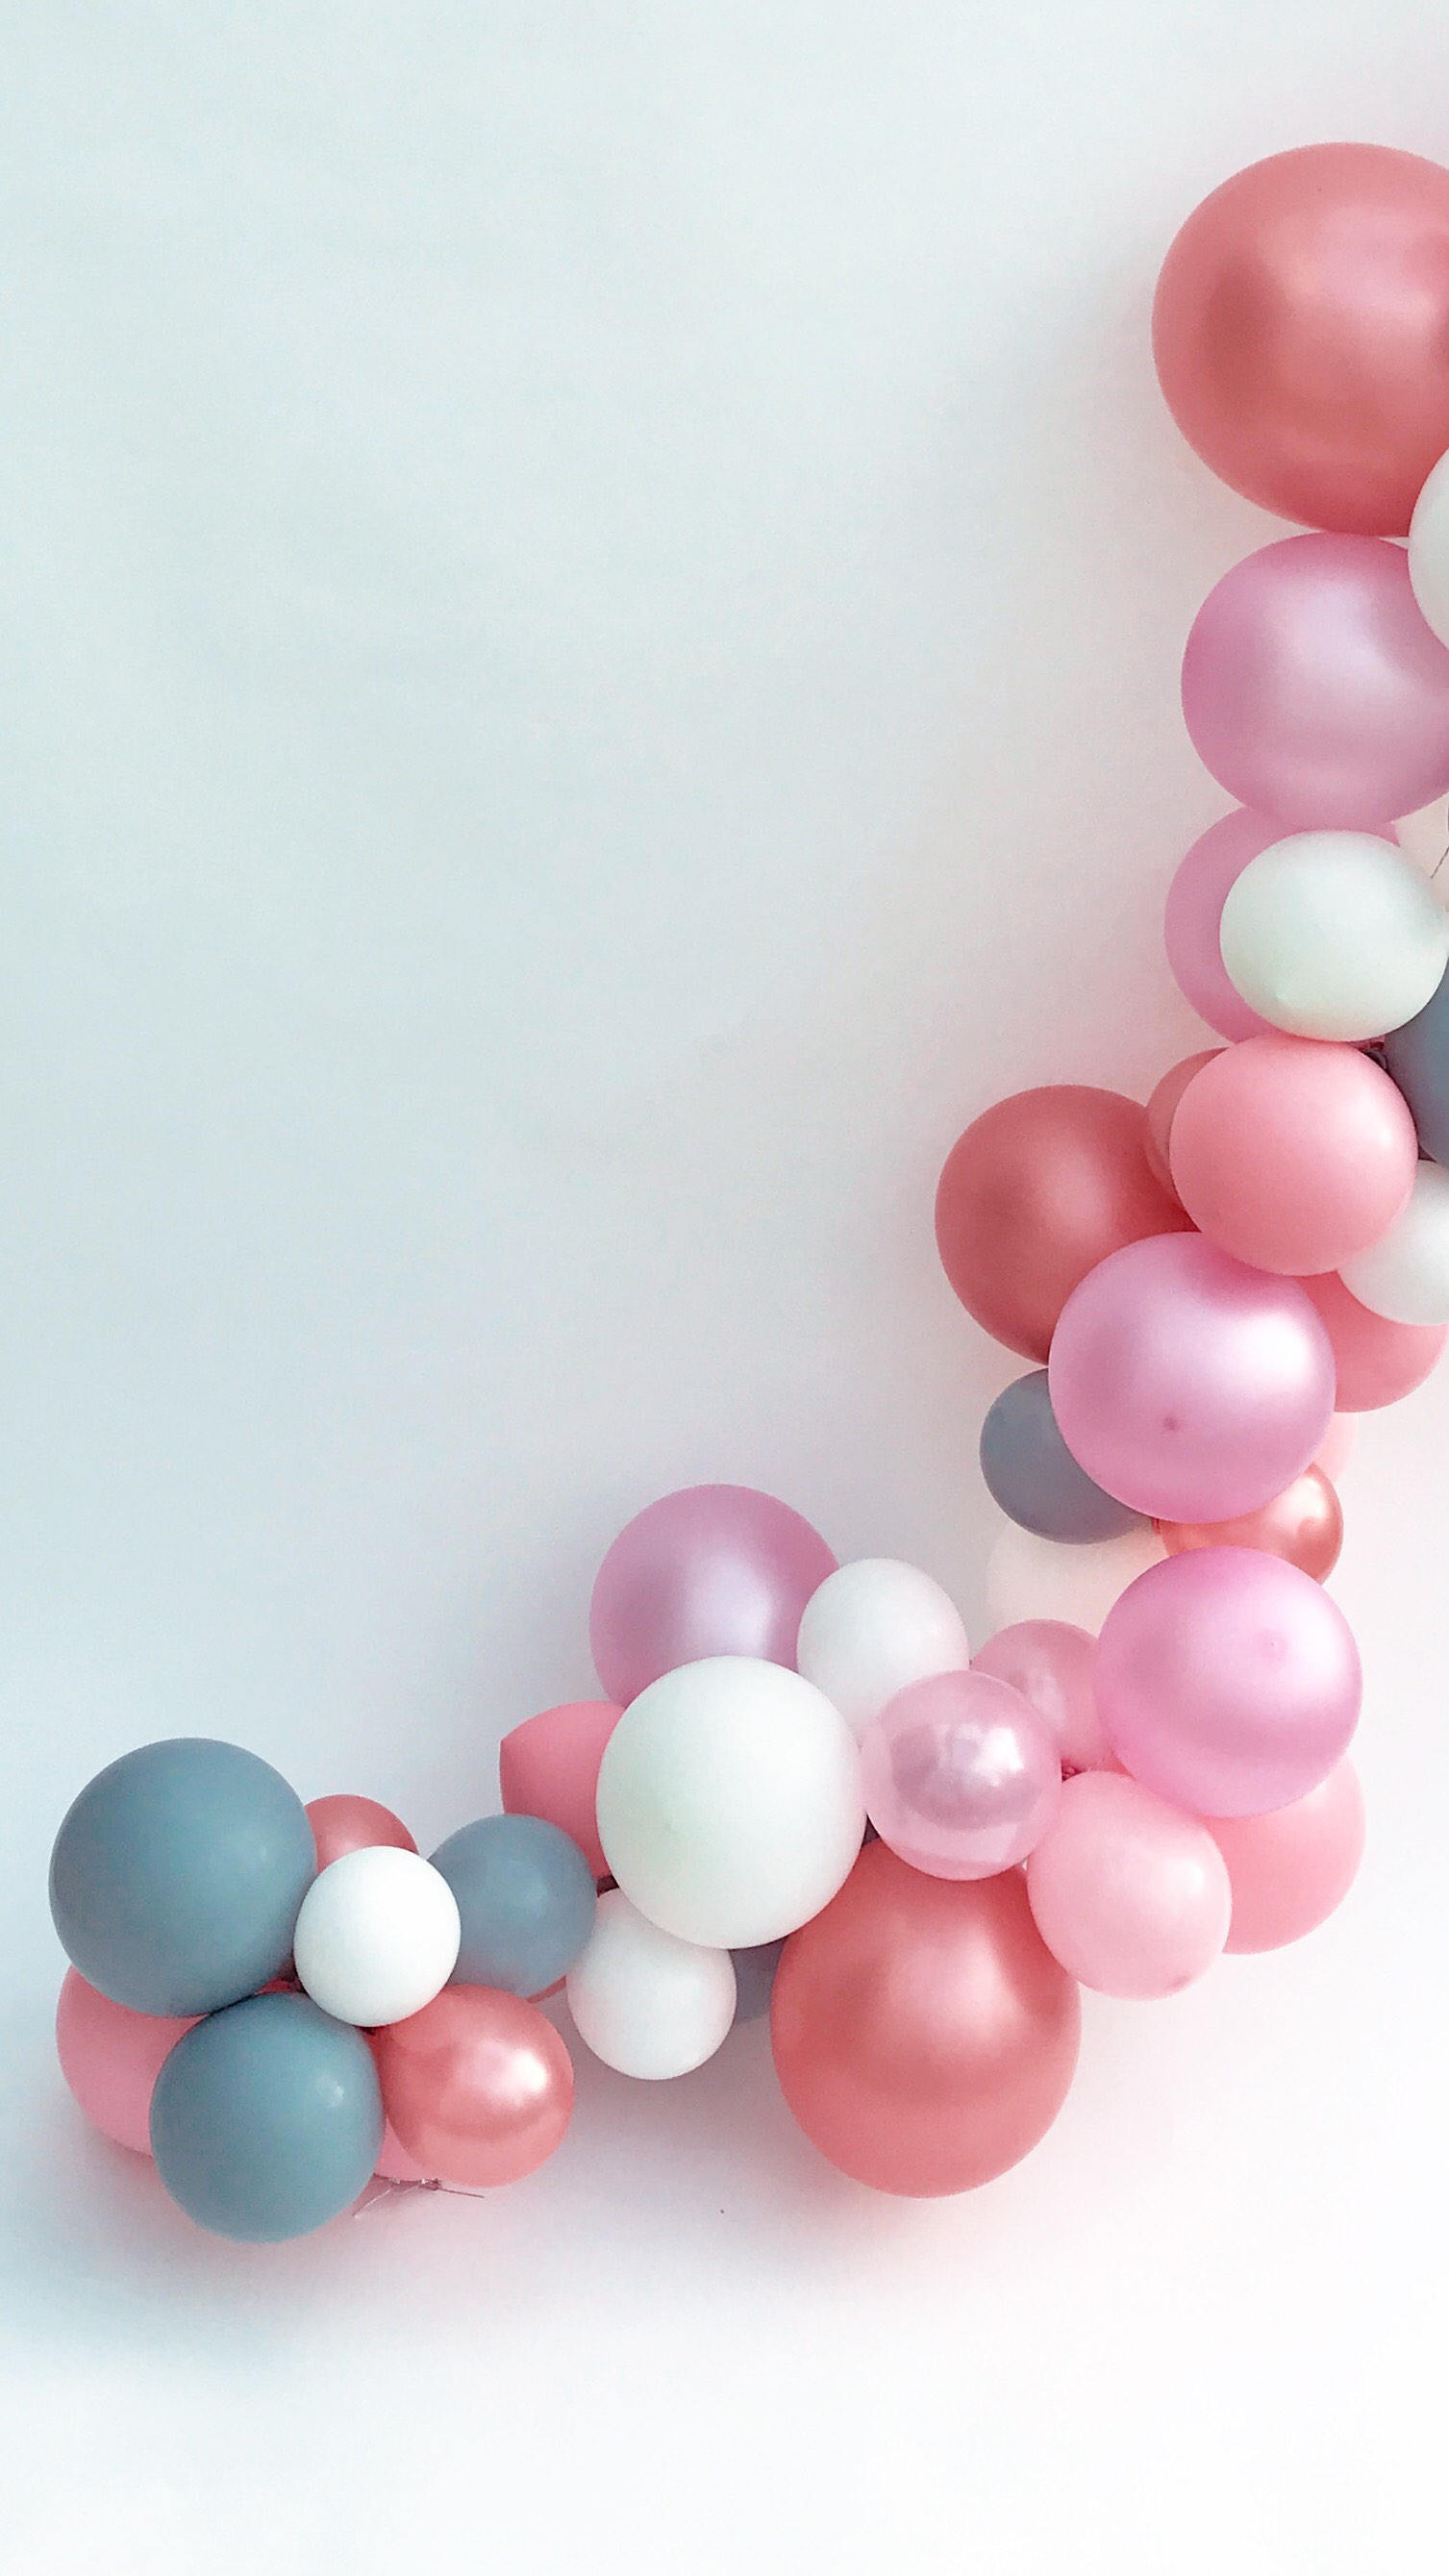 8a28ceba3 Rose Gold/ Pink/ Grey Latex Balloons DIY Balloon Garland- Balloon ...